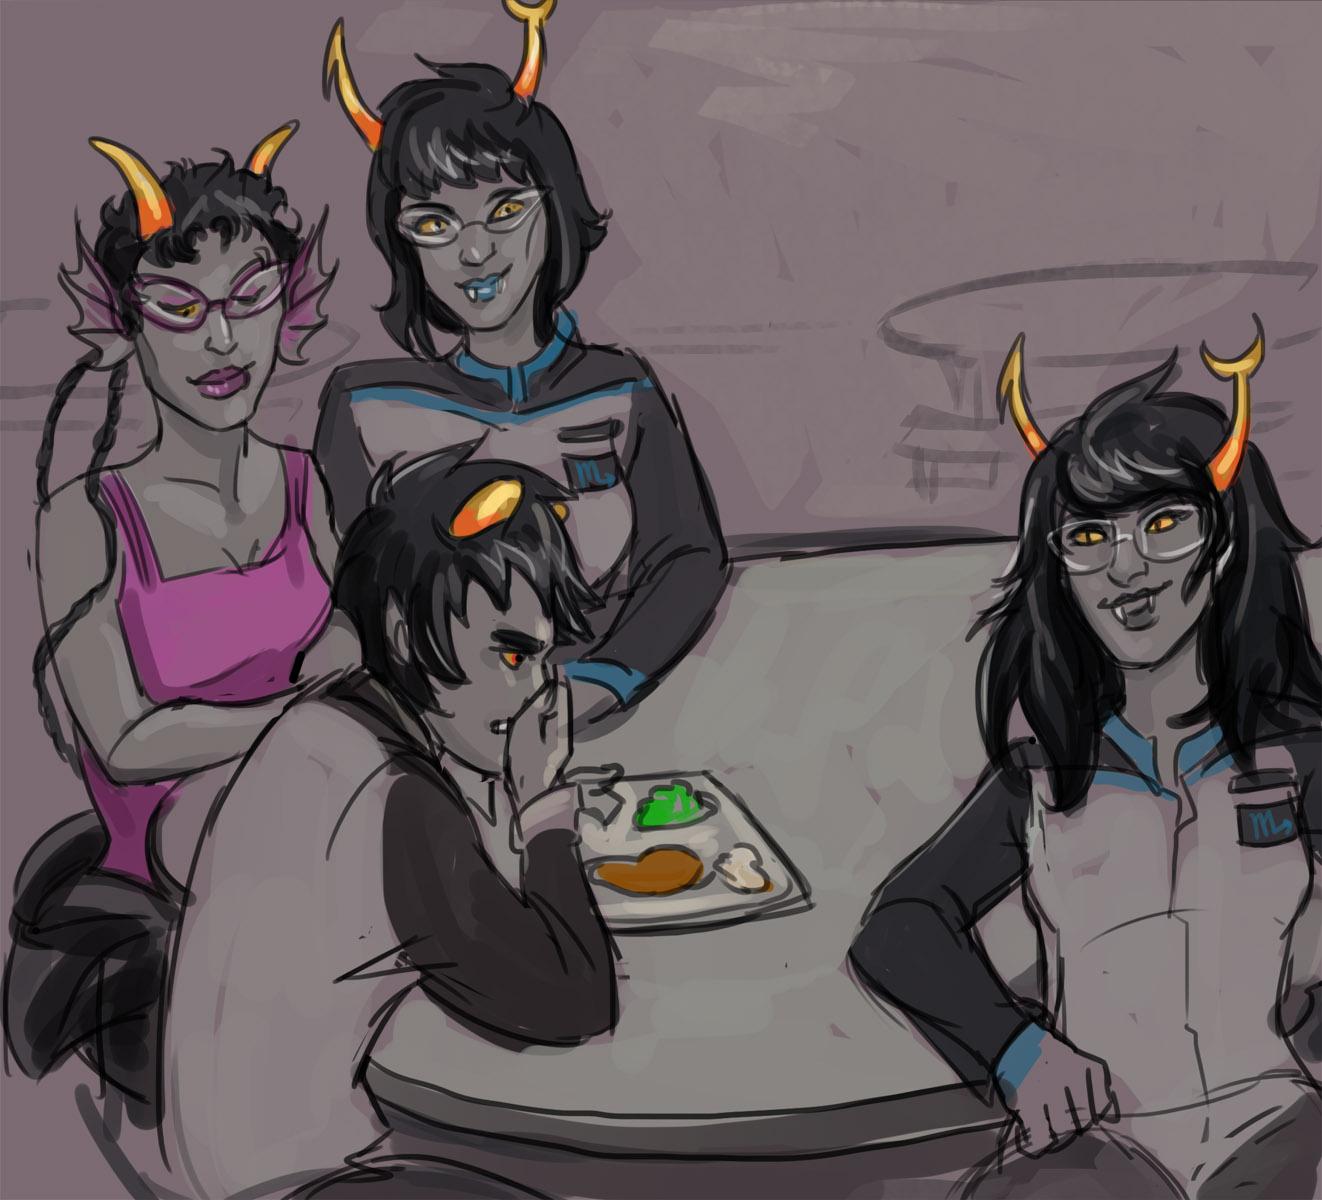 Karkat, Meenah, Vriska and Aranea at breakfast.